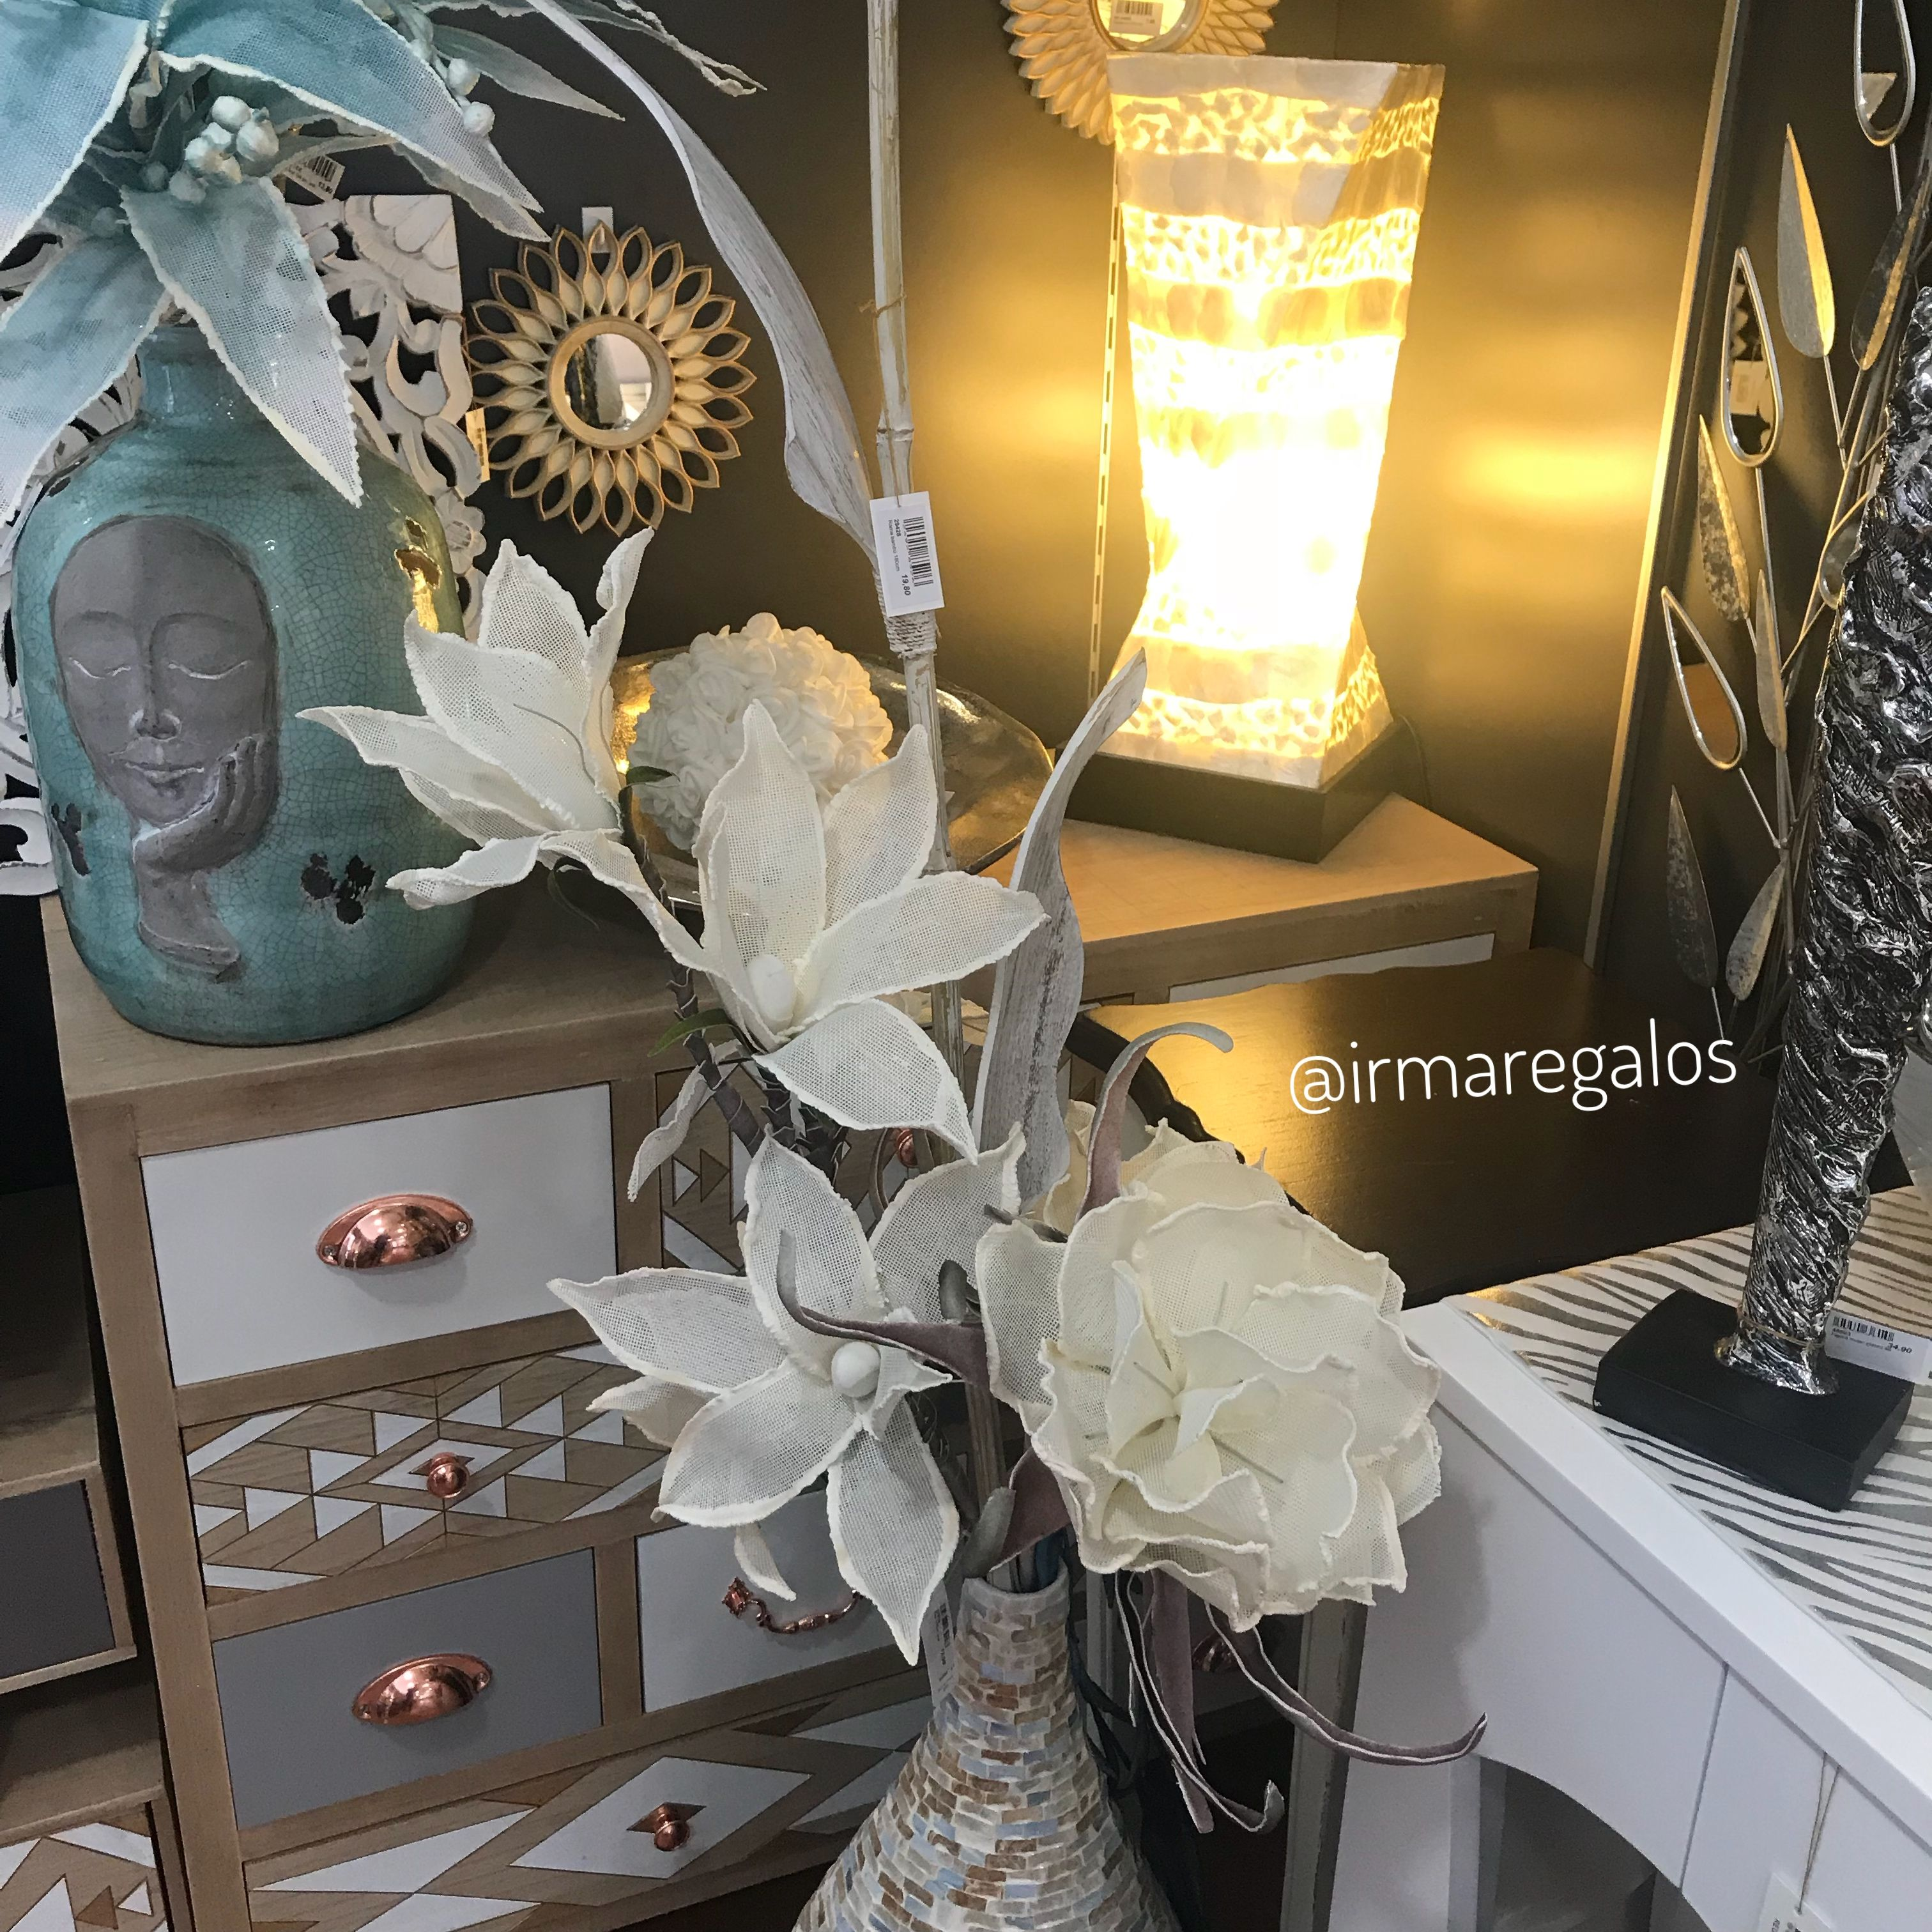 Pin de Irma Regalos en Muebles | Pinterest